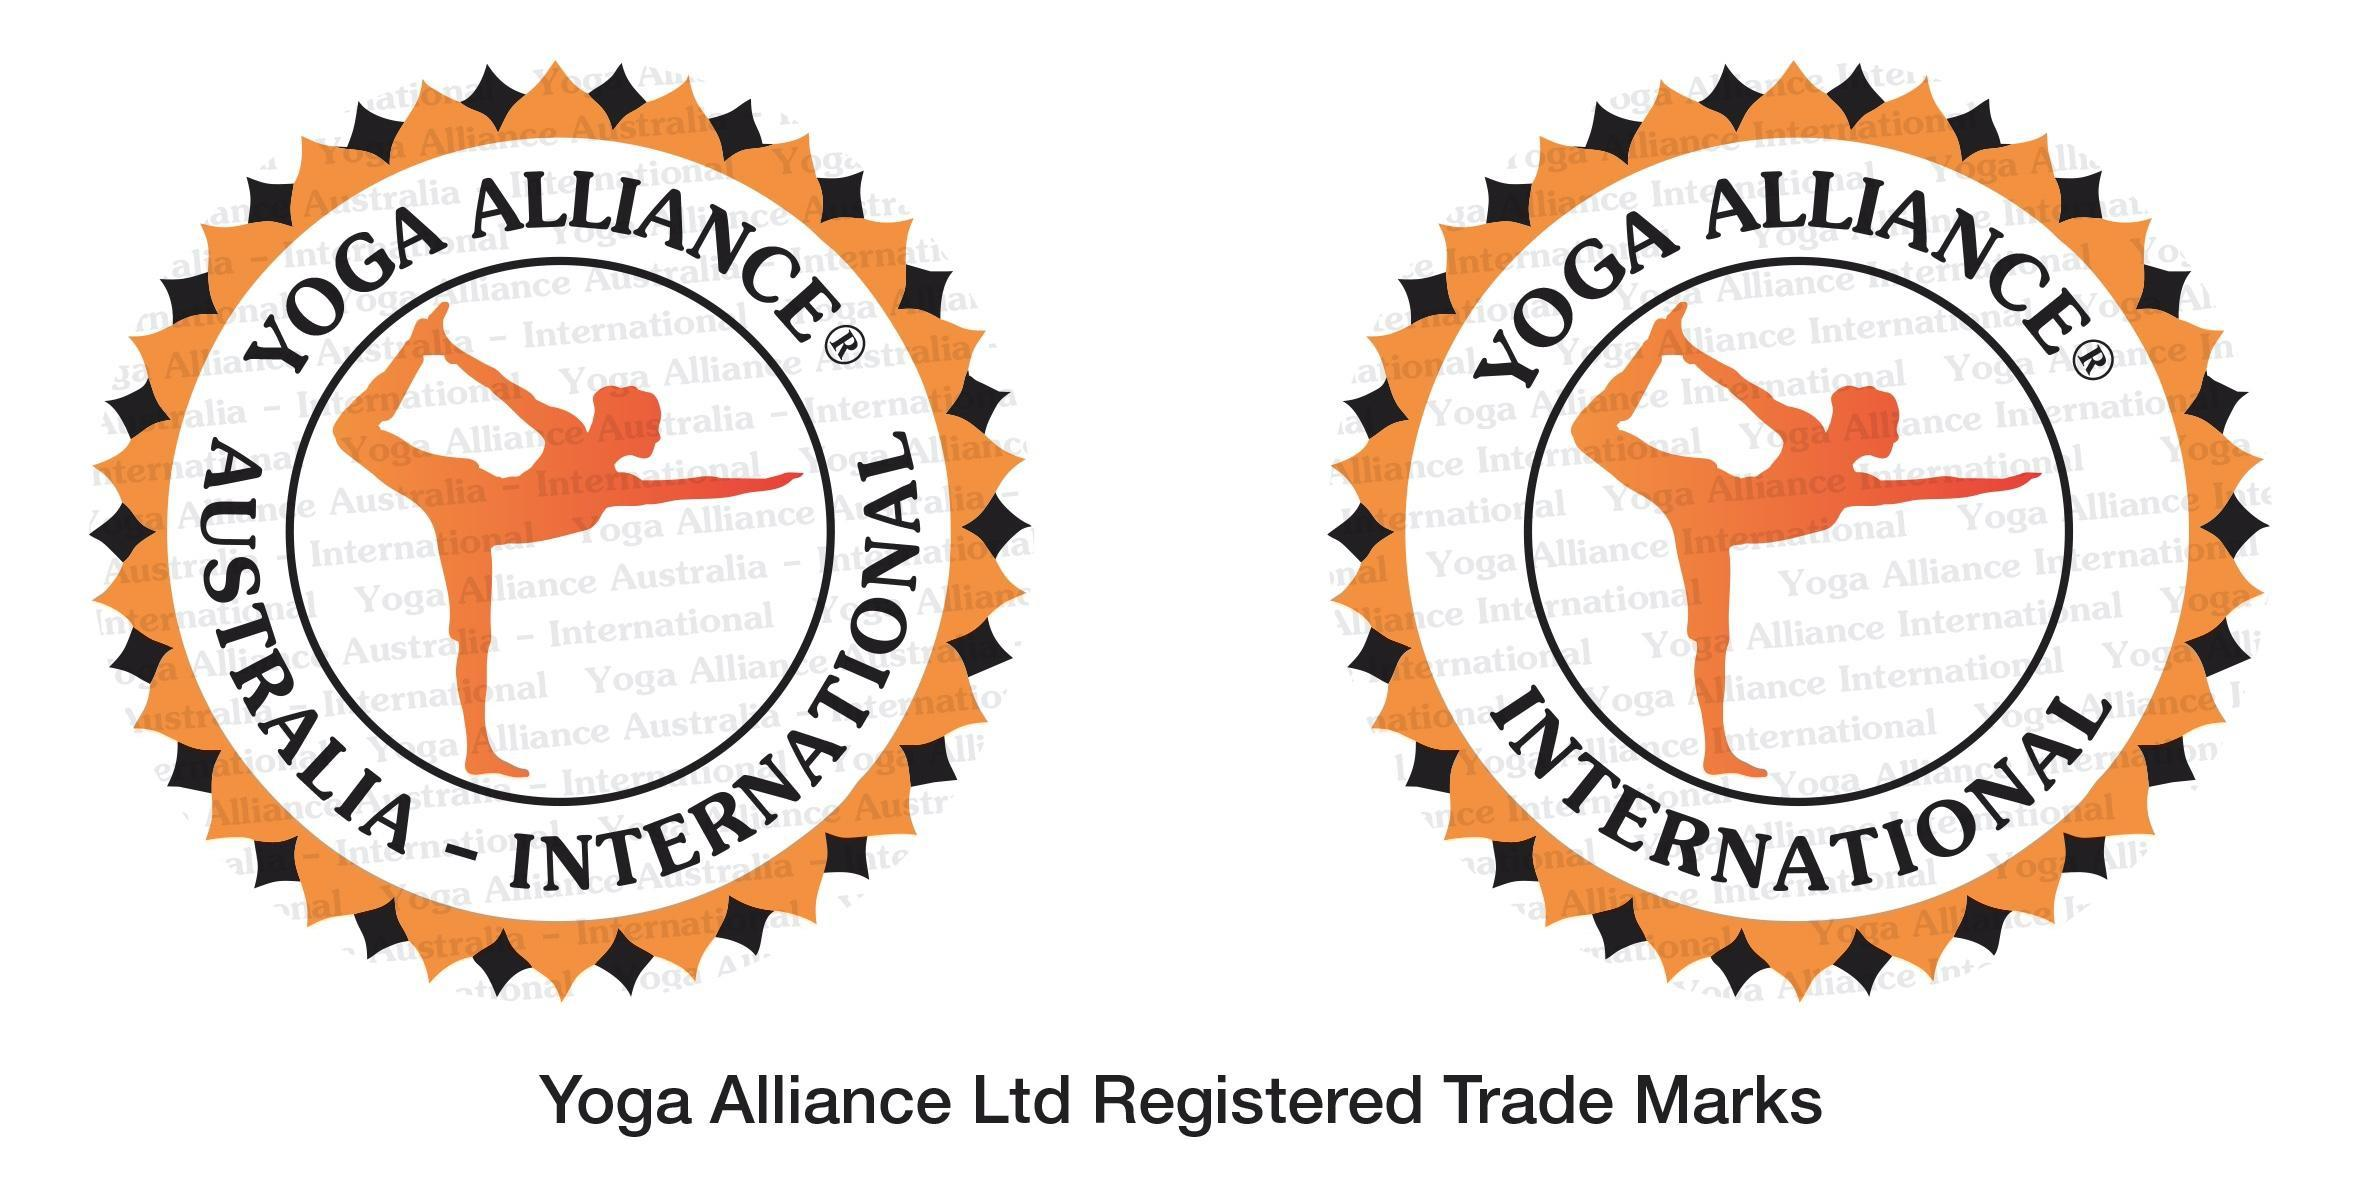 Yoga Alliance Australia International